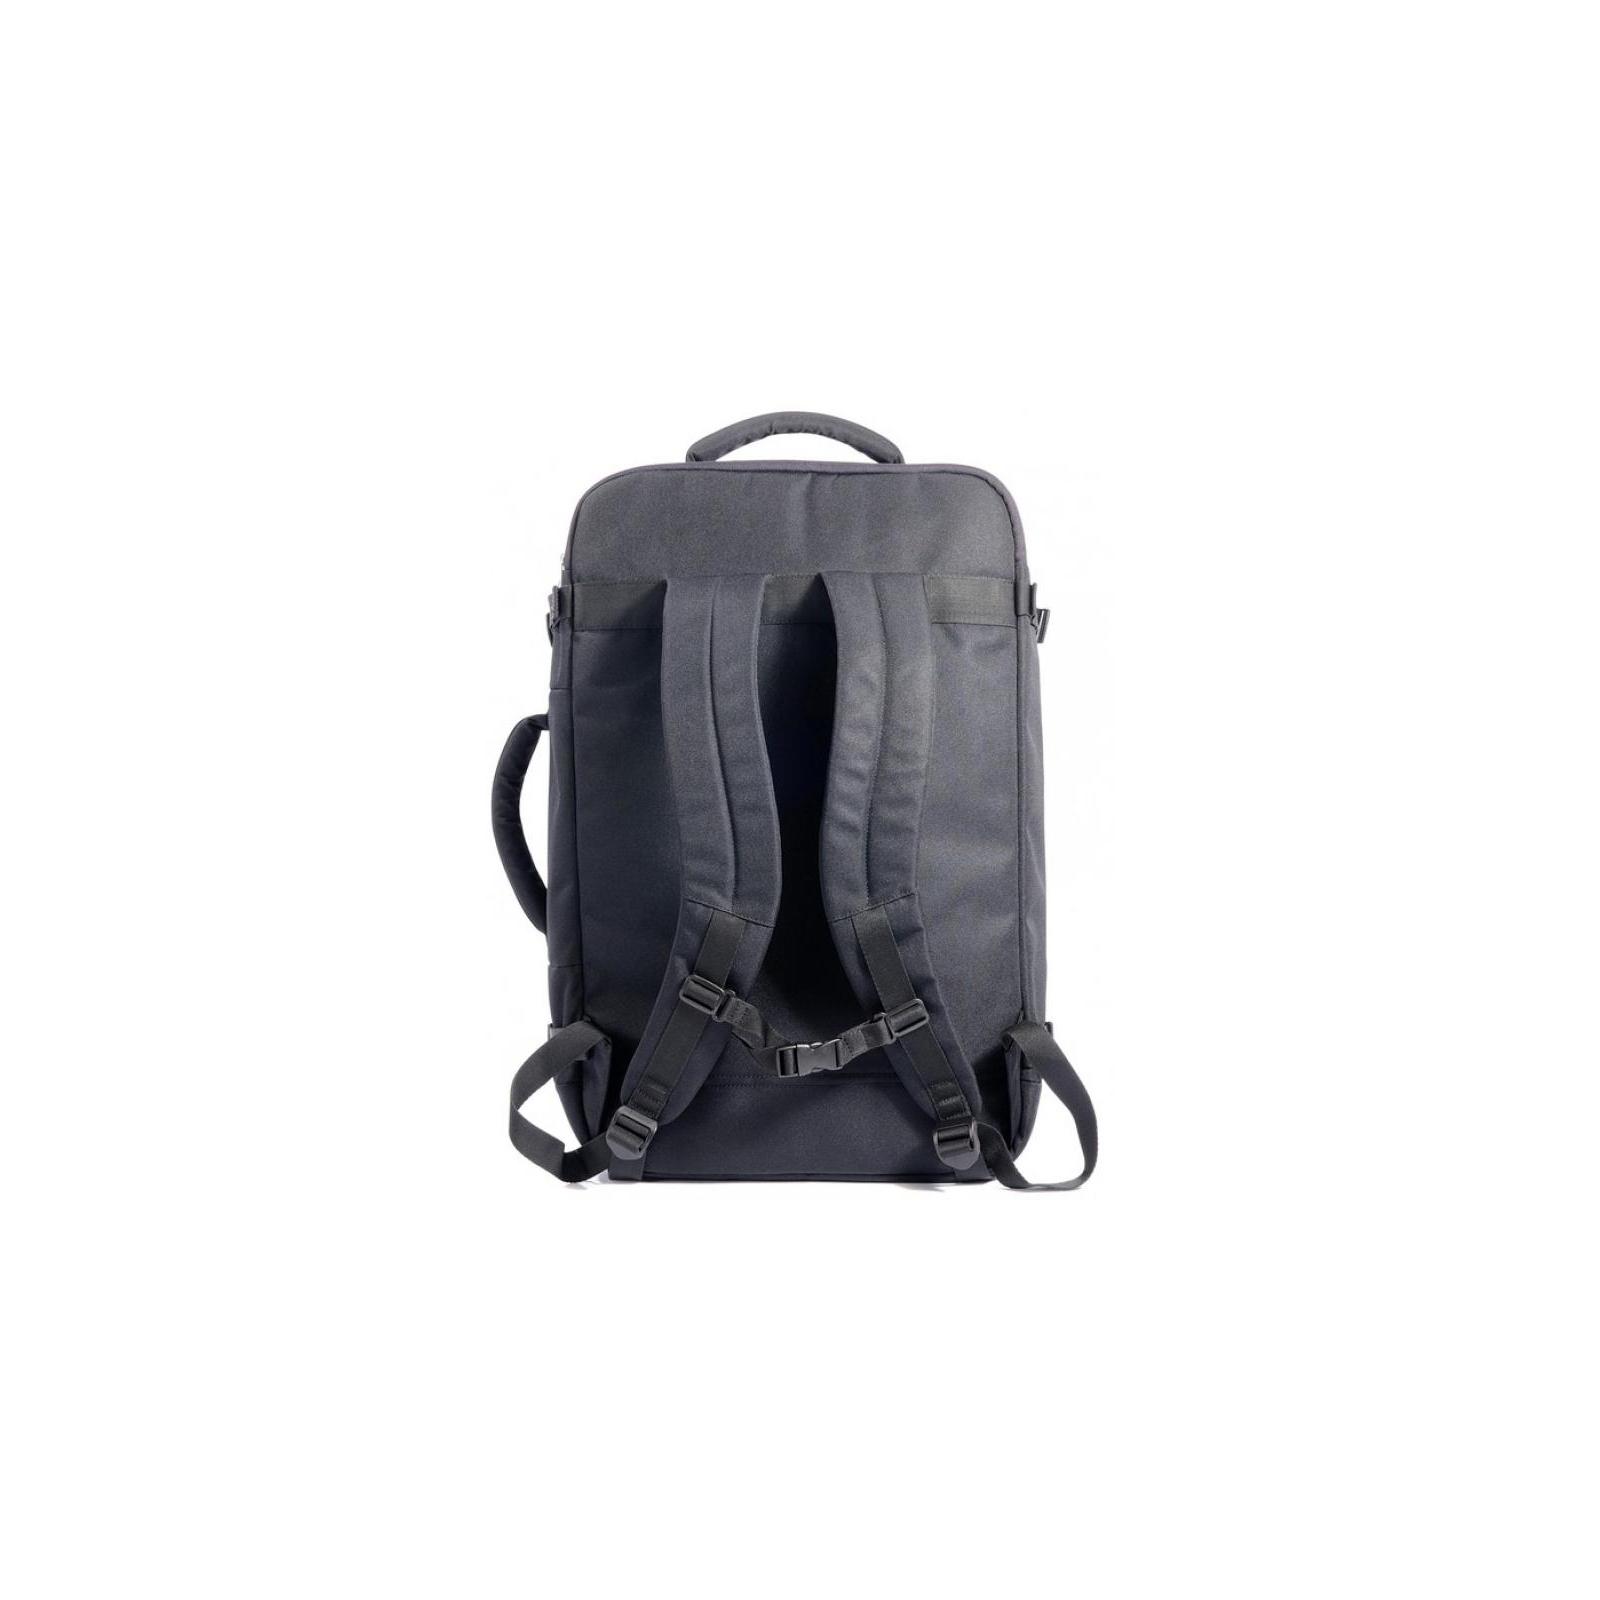 "Рюкзак для ноутбука Tucano 17.3"" TUGO' L CABIN black (BKTUG-L-BK) изображение 3"